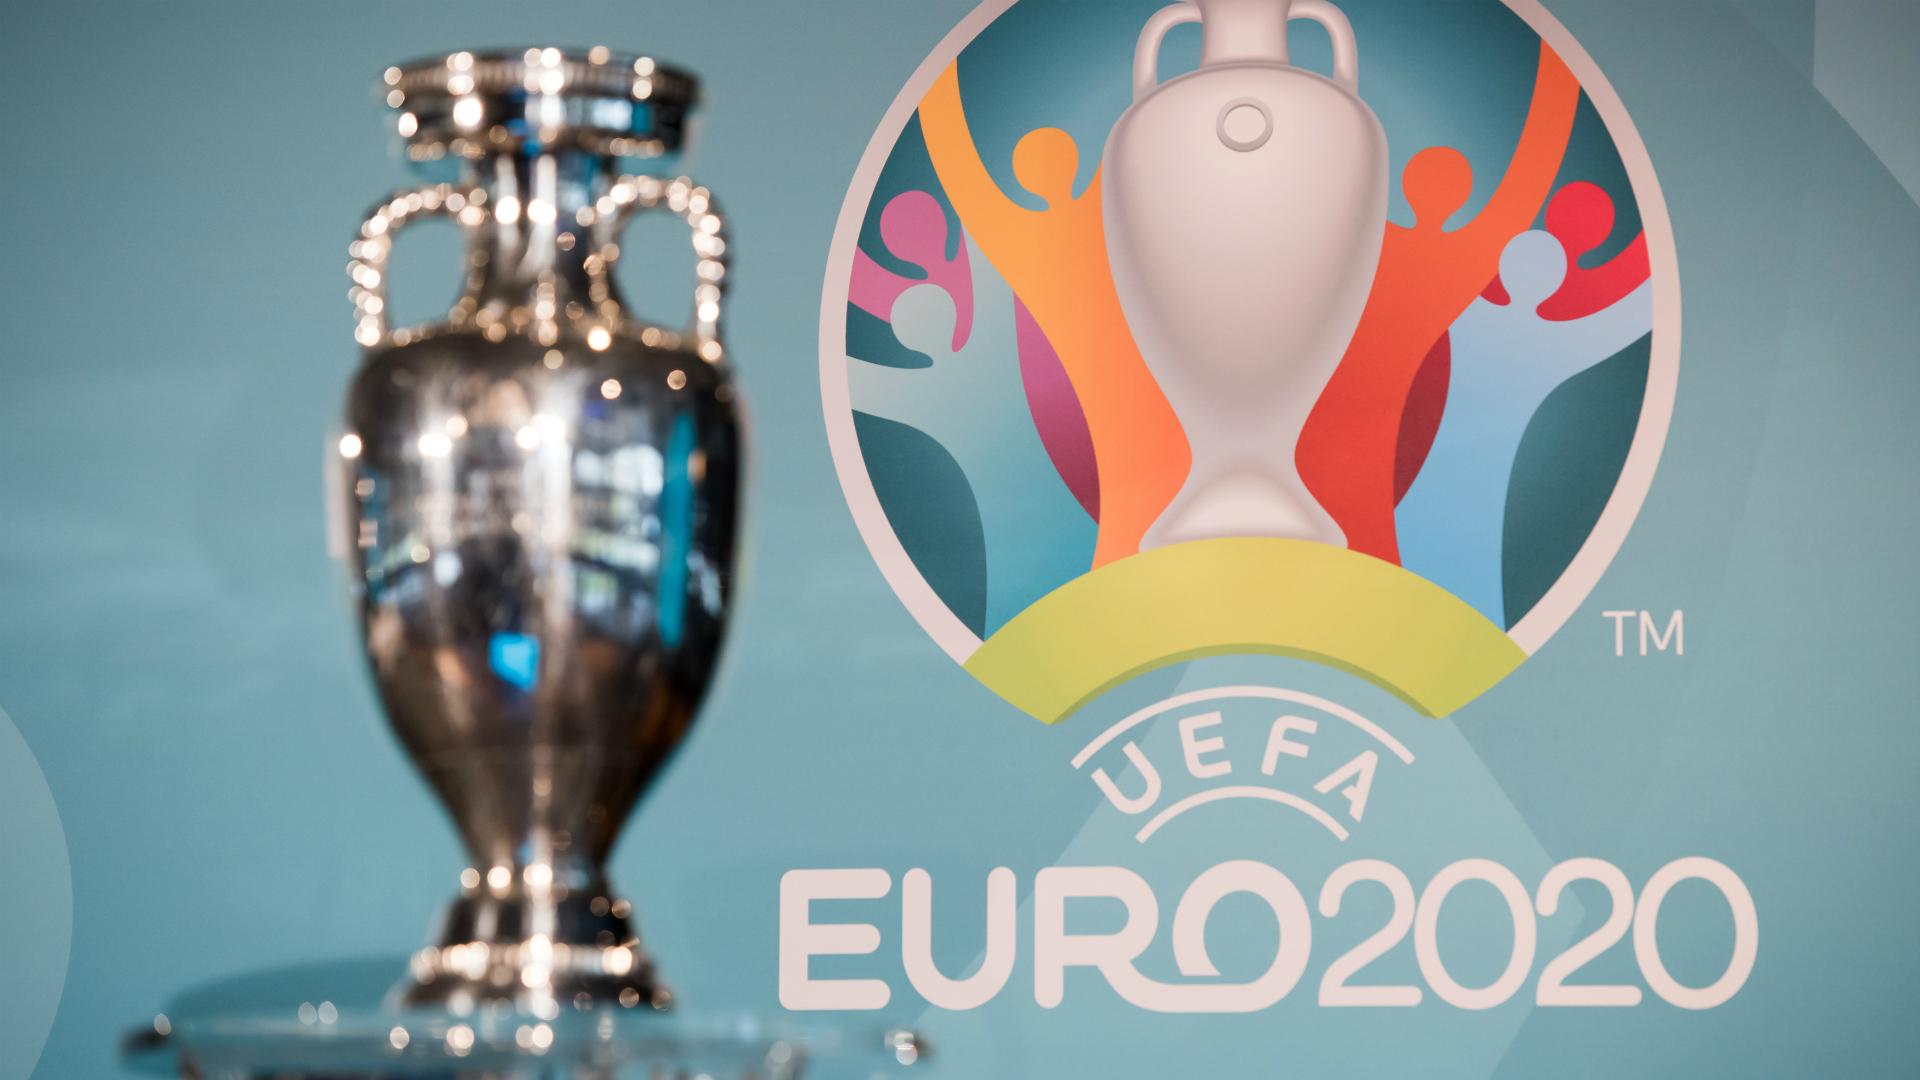 Qualificazioni Europei 2020, i risultati - Cultura a Colori